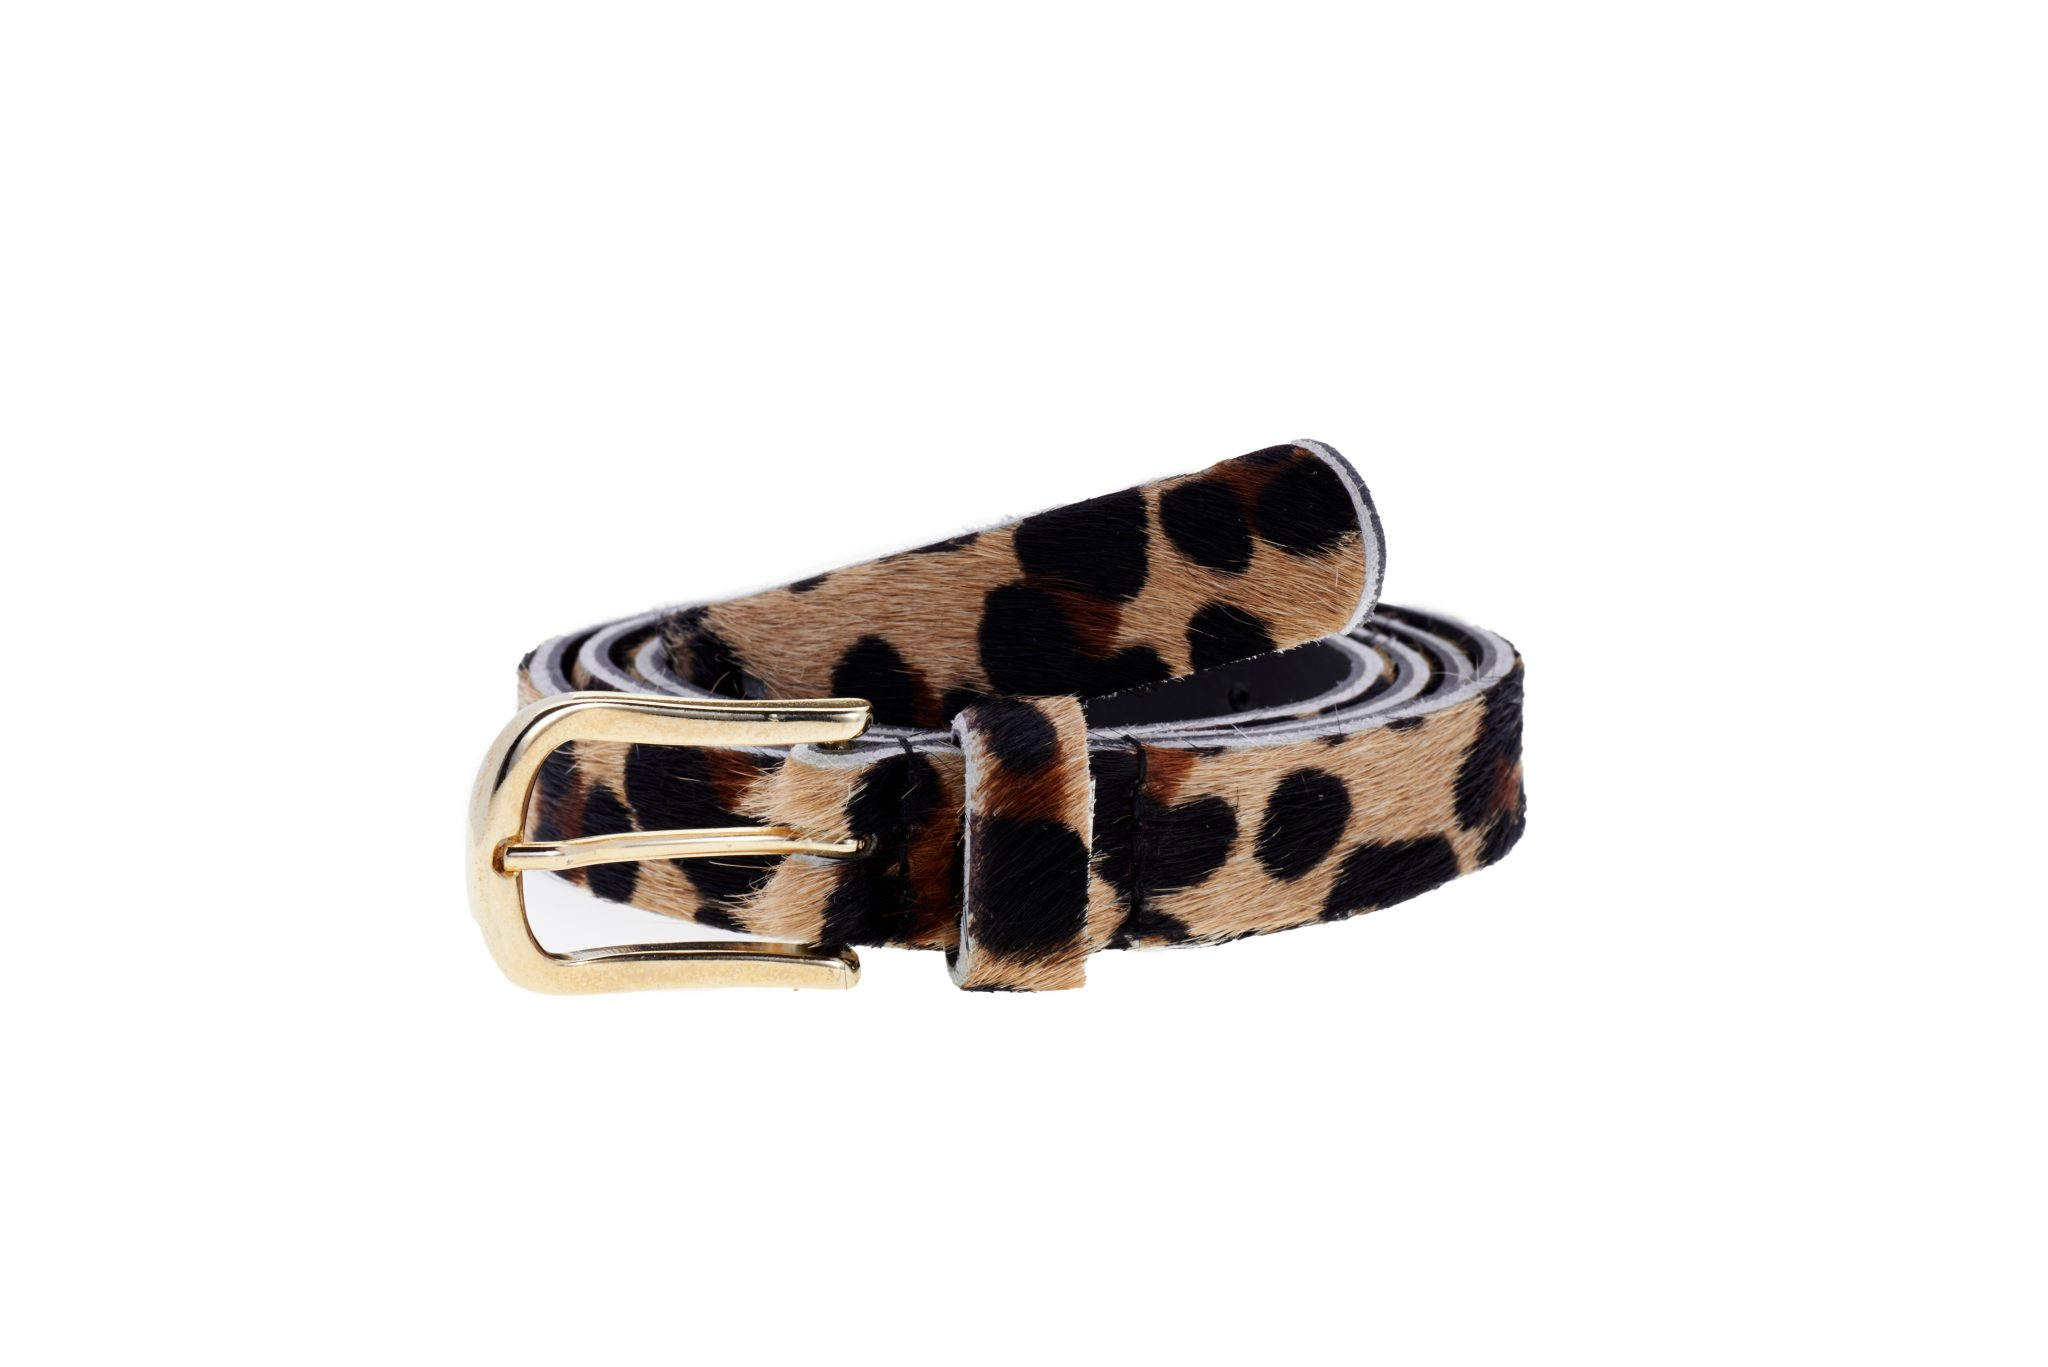 a9a838f6a09 Elvy - Belt Skin Small panther - No. 28 wonen & lifestyle